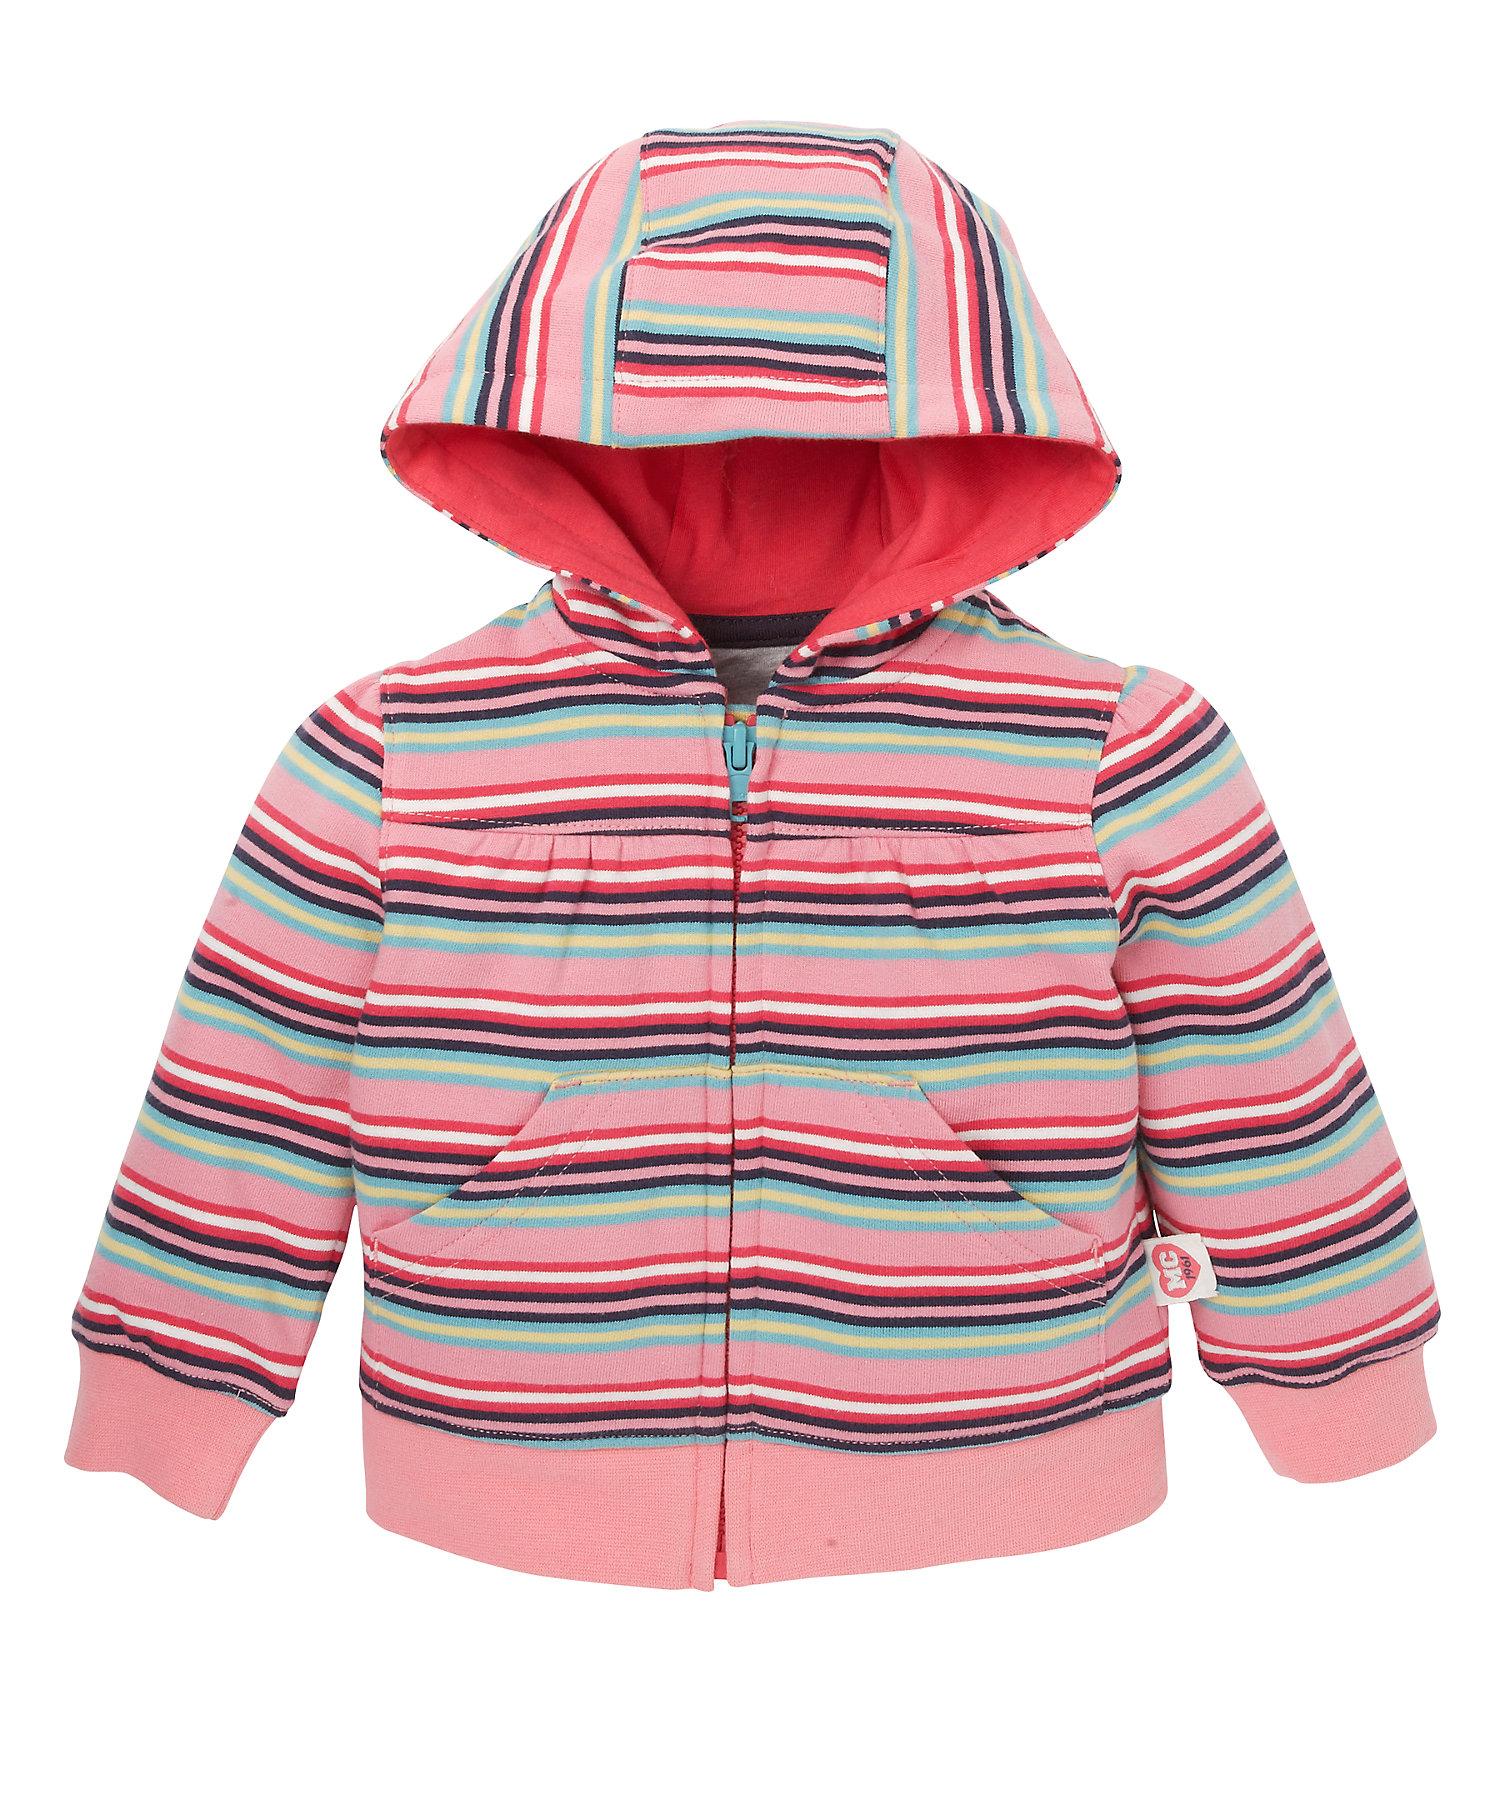 Mothercare | Girls Full Sleeves Hooded Sweatshirt Striped - Pink